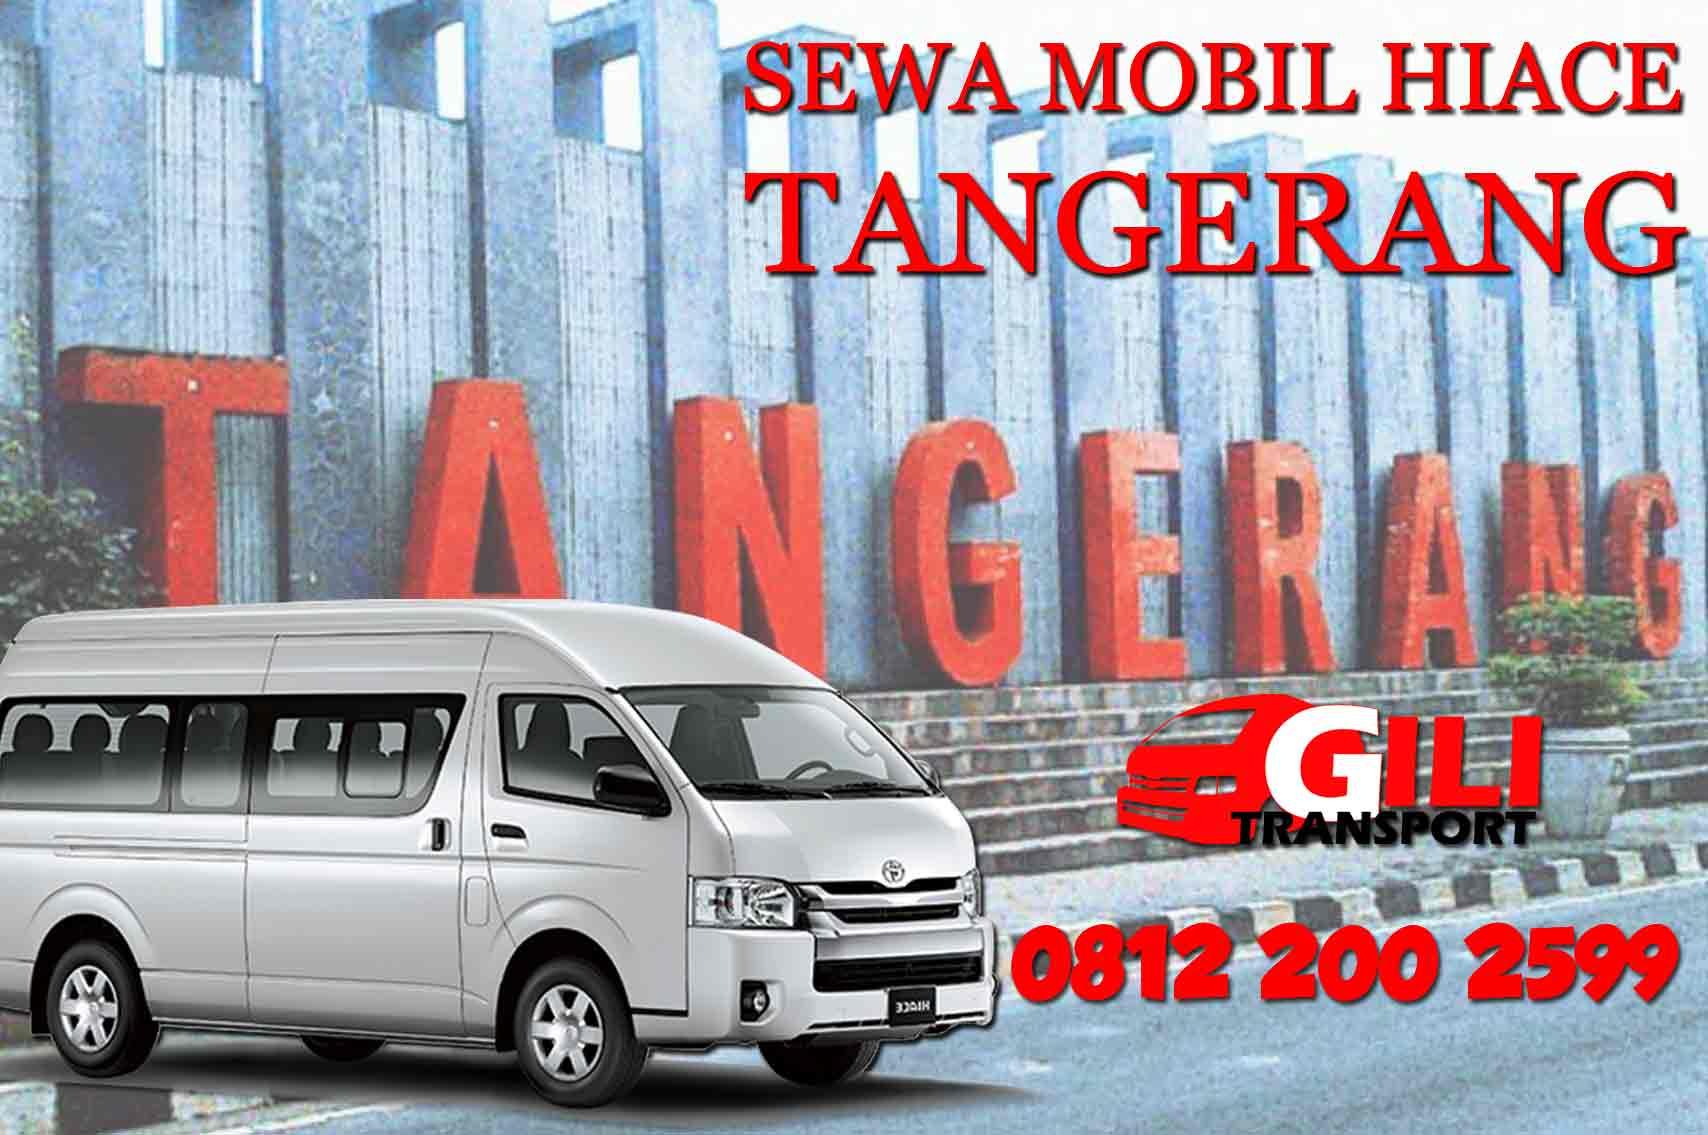 sewa mobil hiace di Tangerang gilitrans